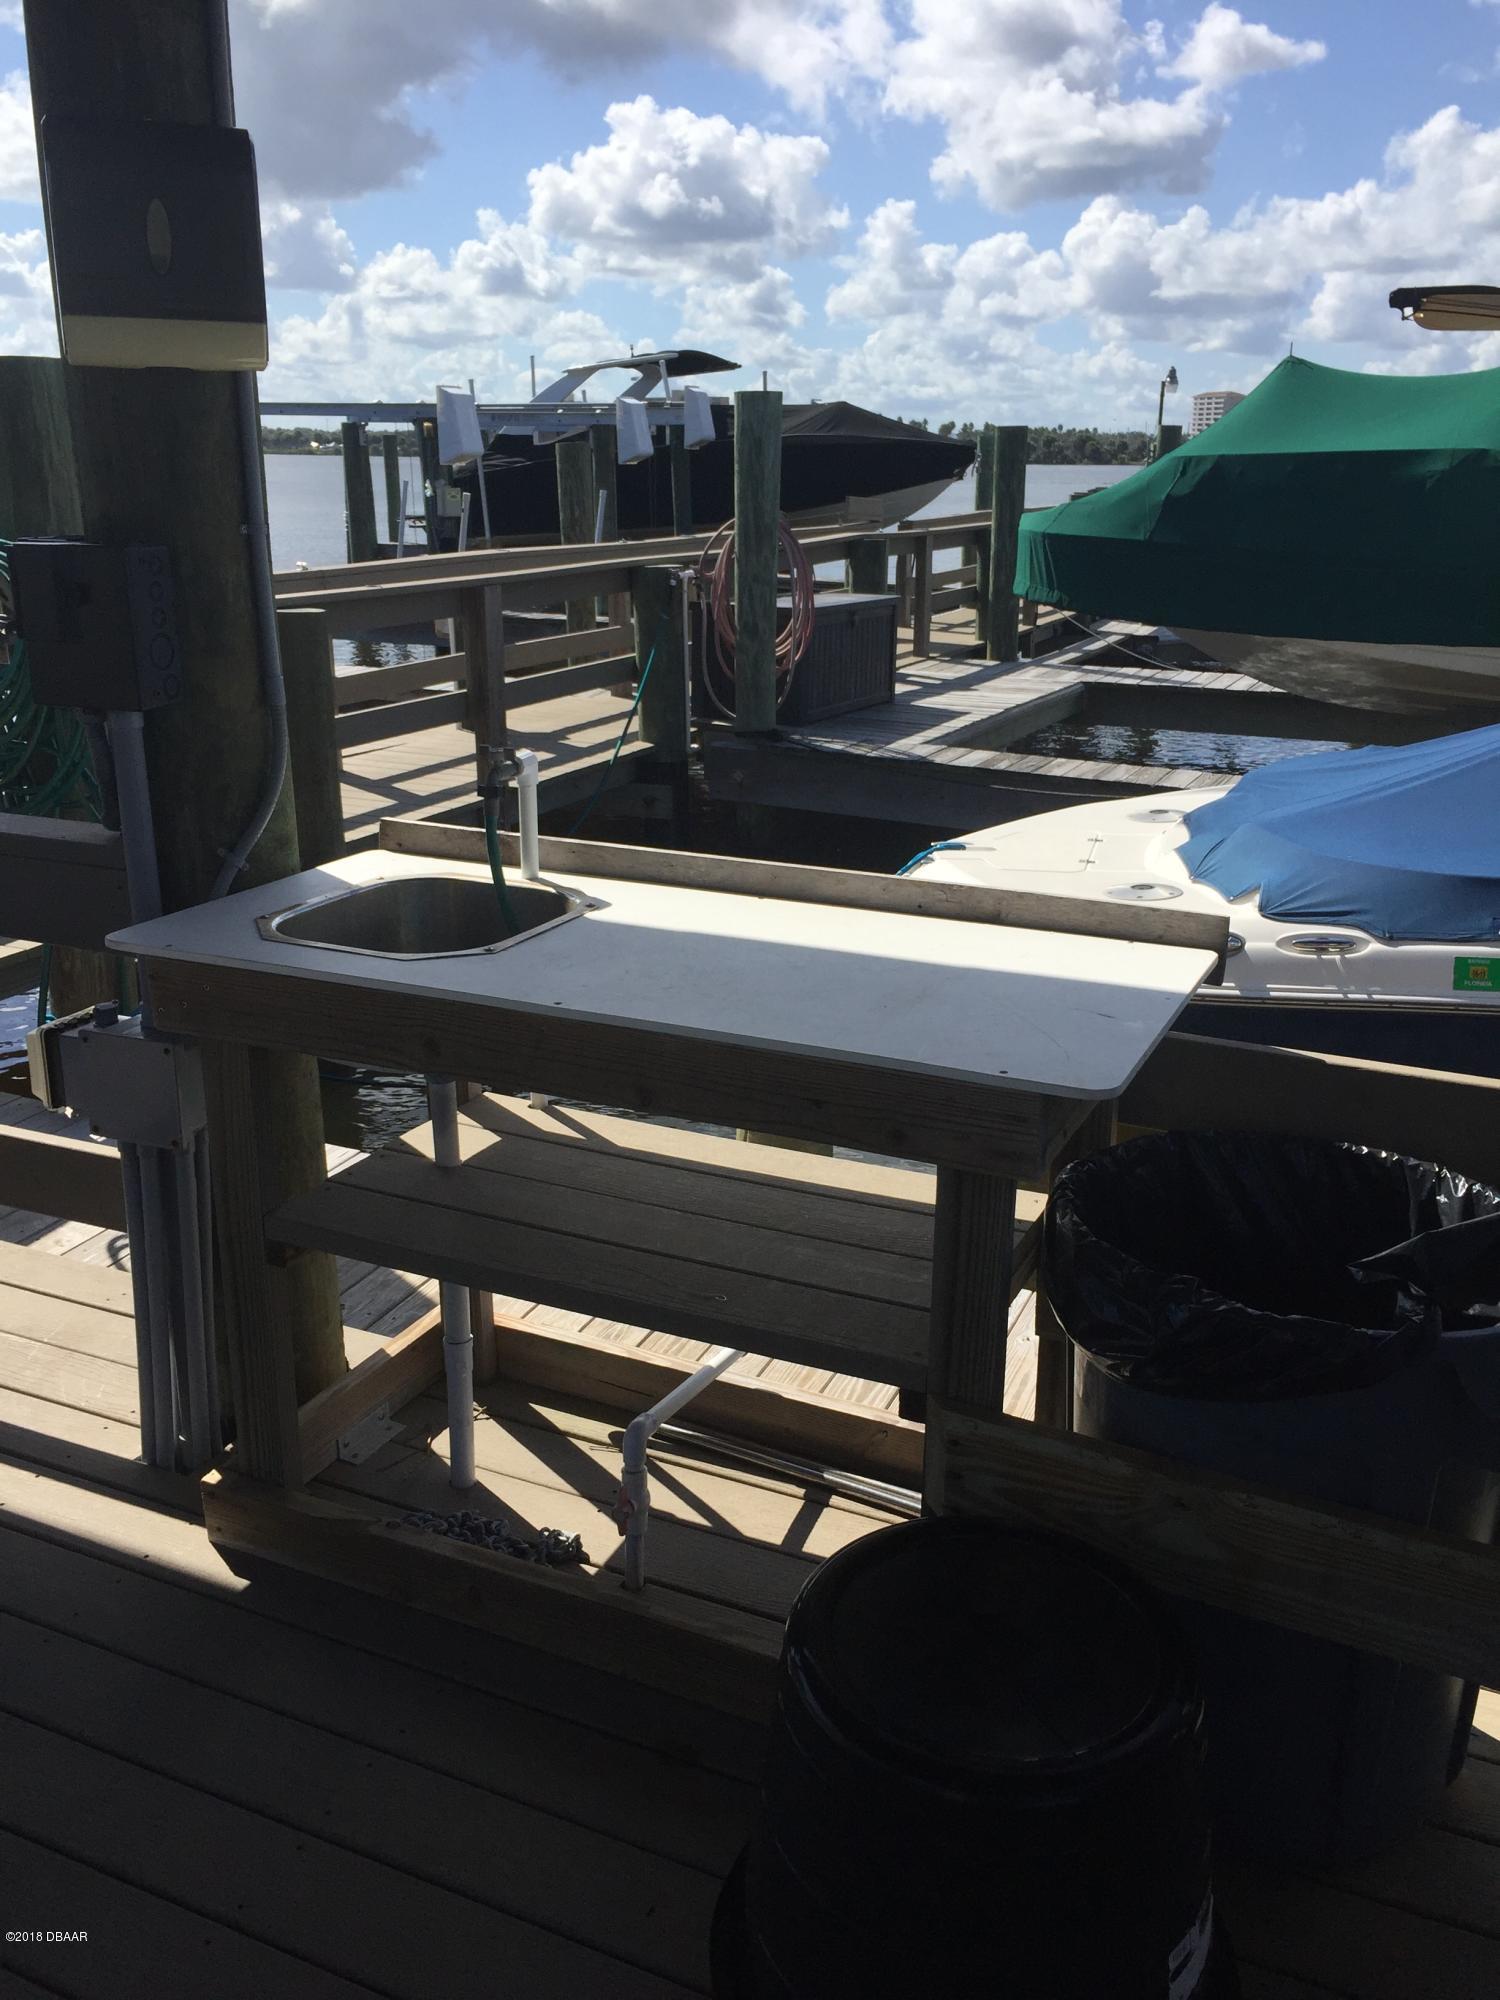 100 Silver Beach Daytona Beach - 5